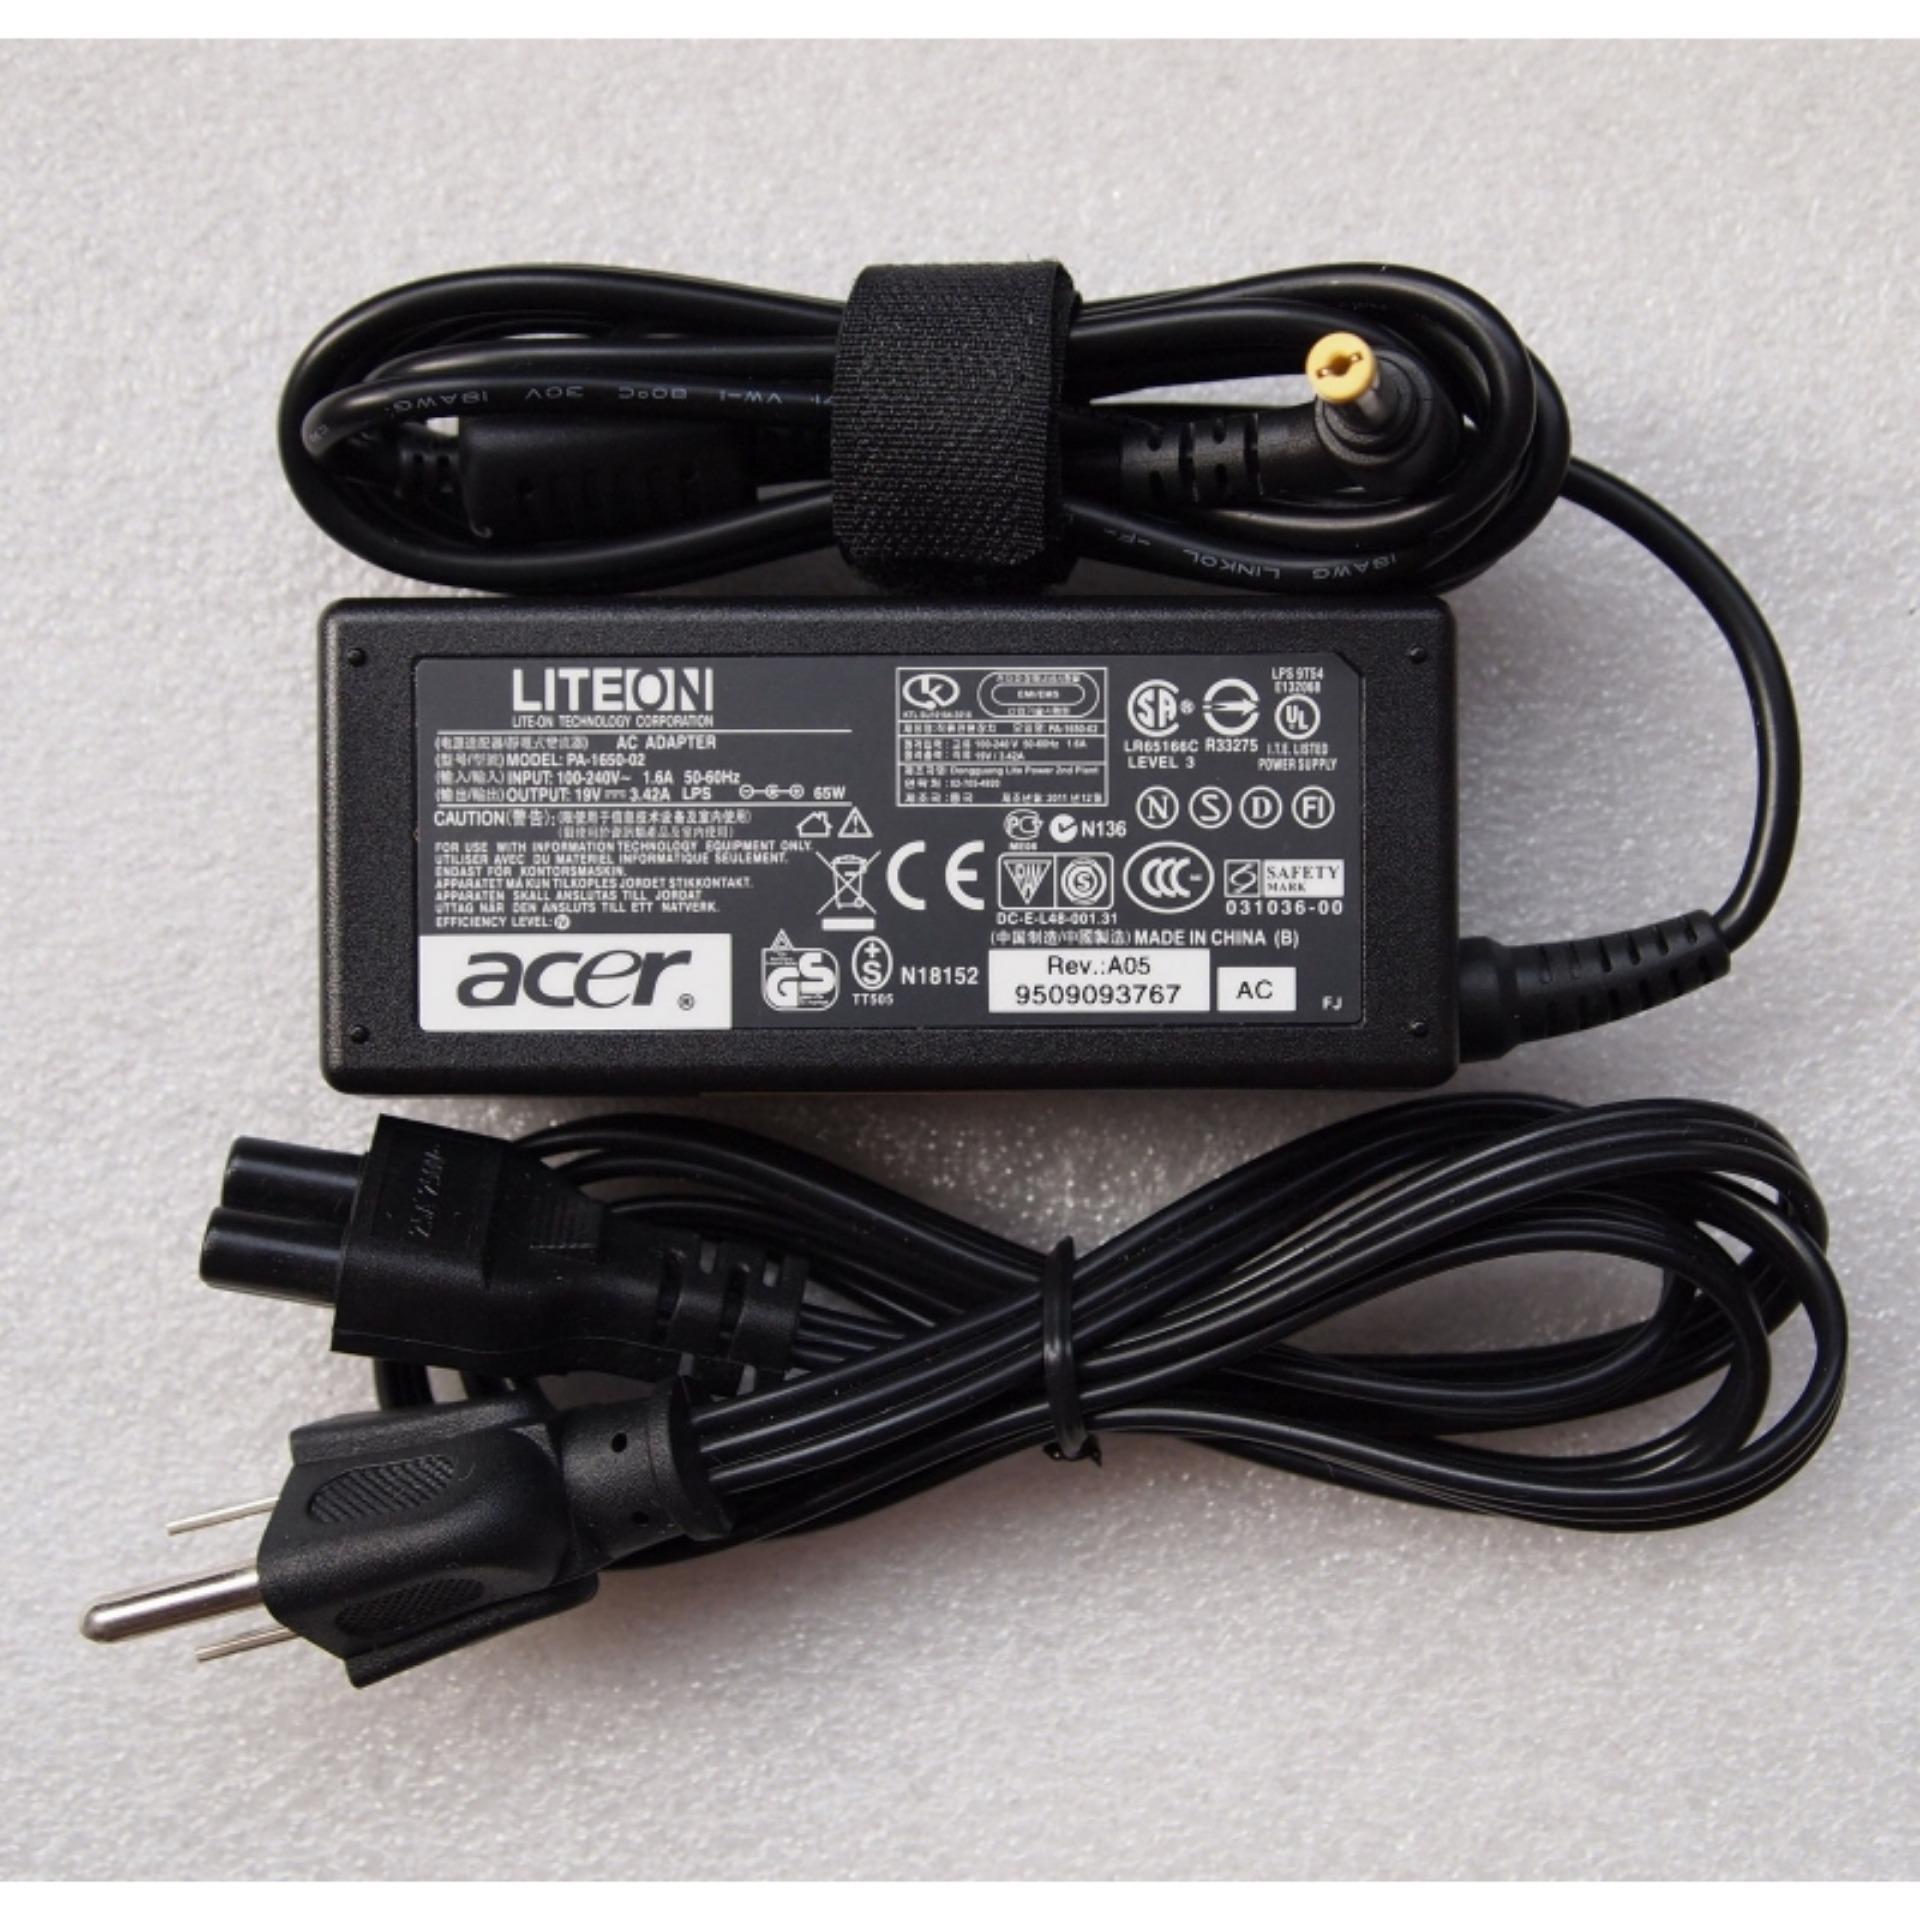 Giá Sạc Laptop ACER/LITEON 19V-3.42A